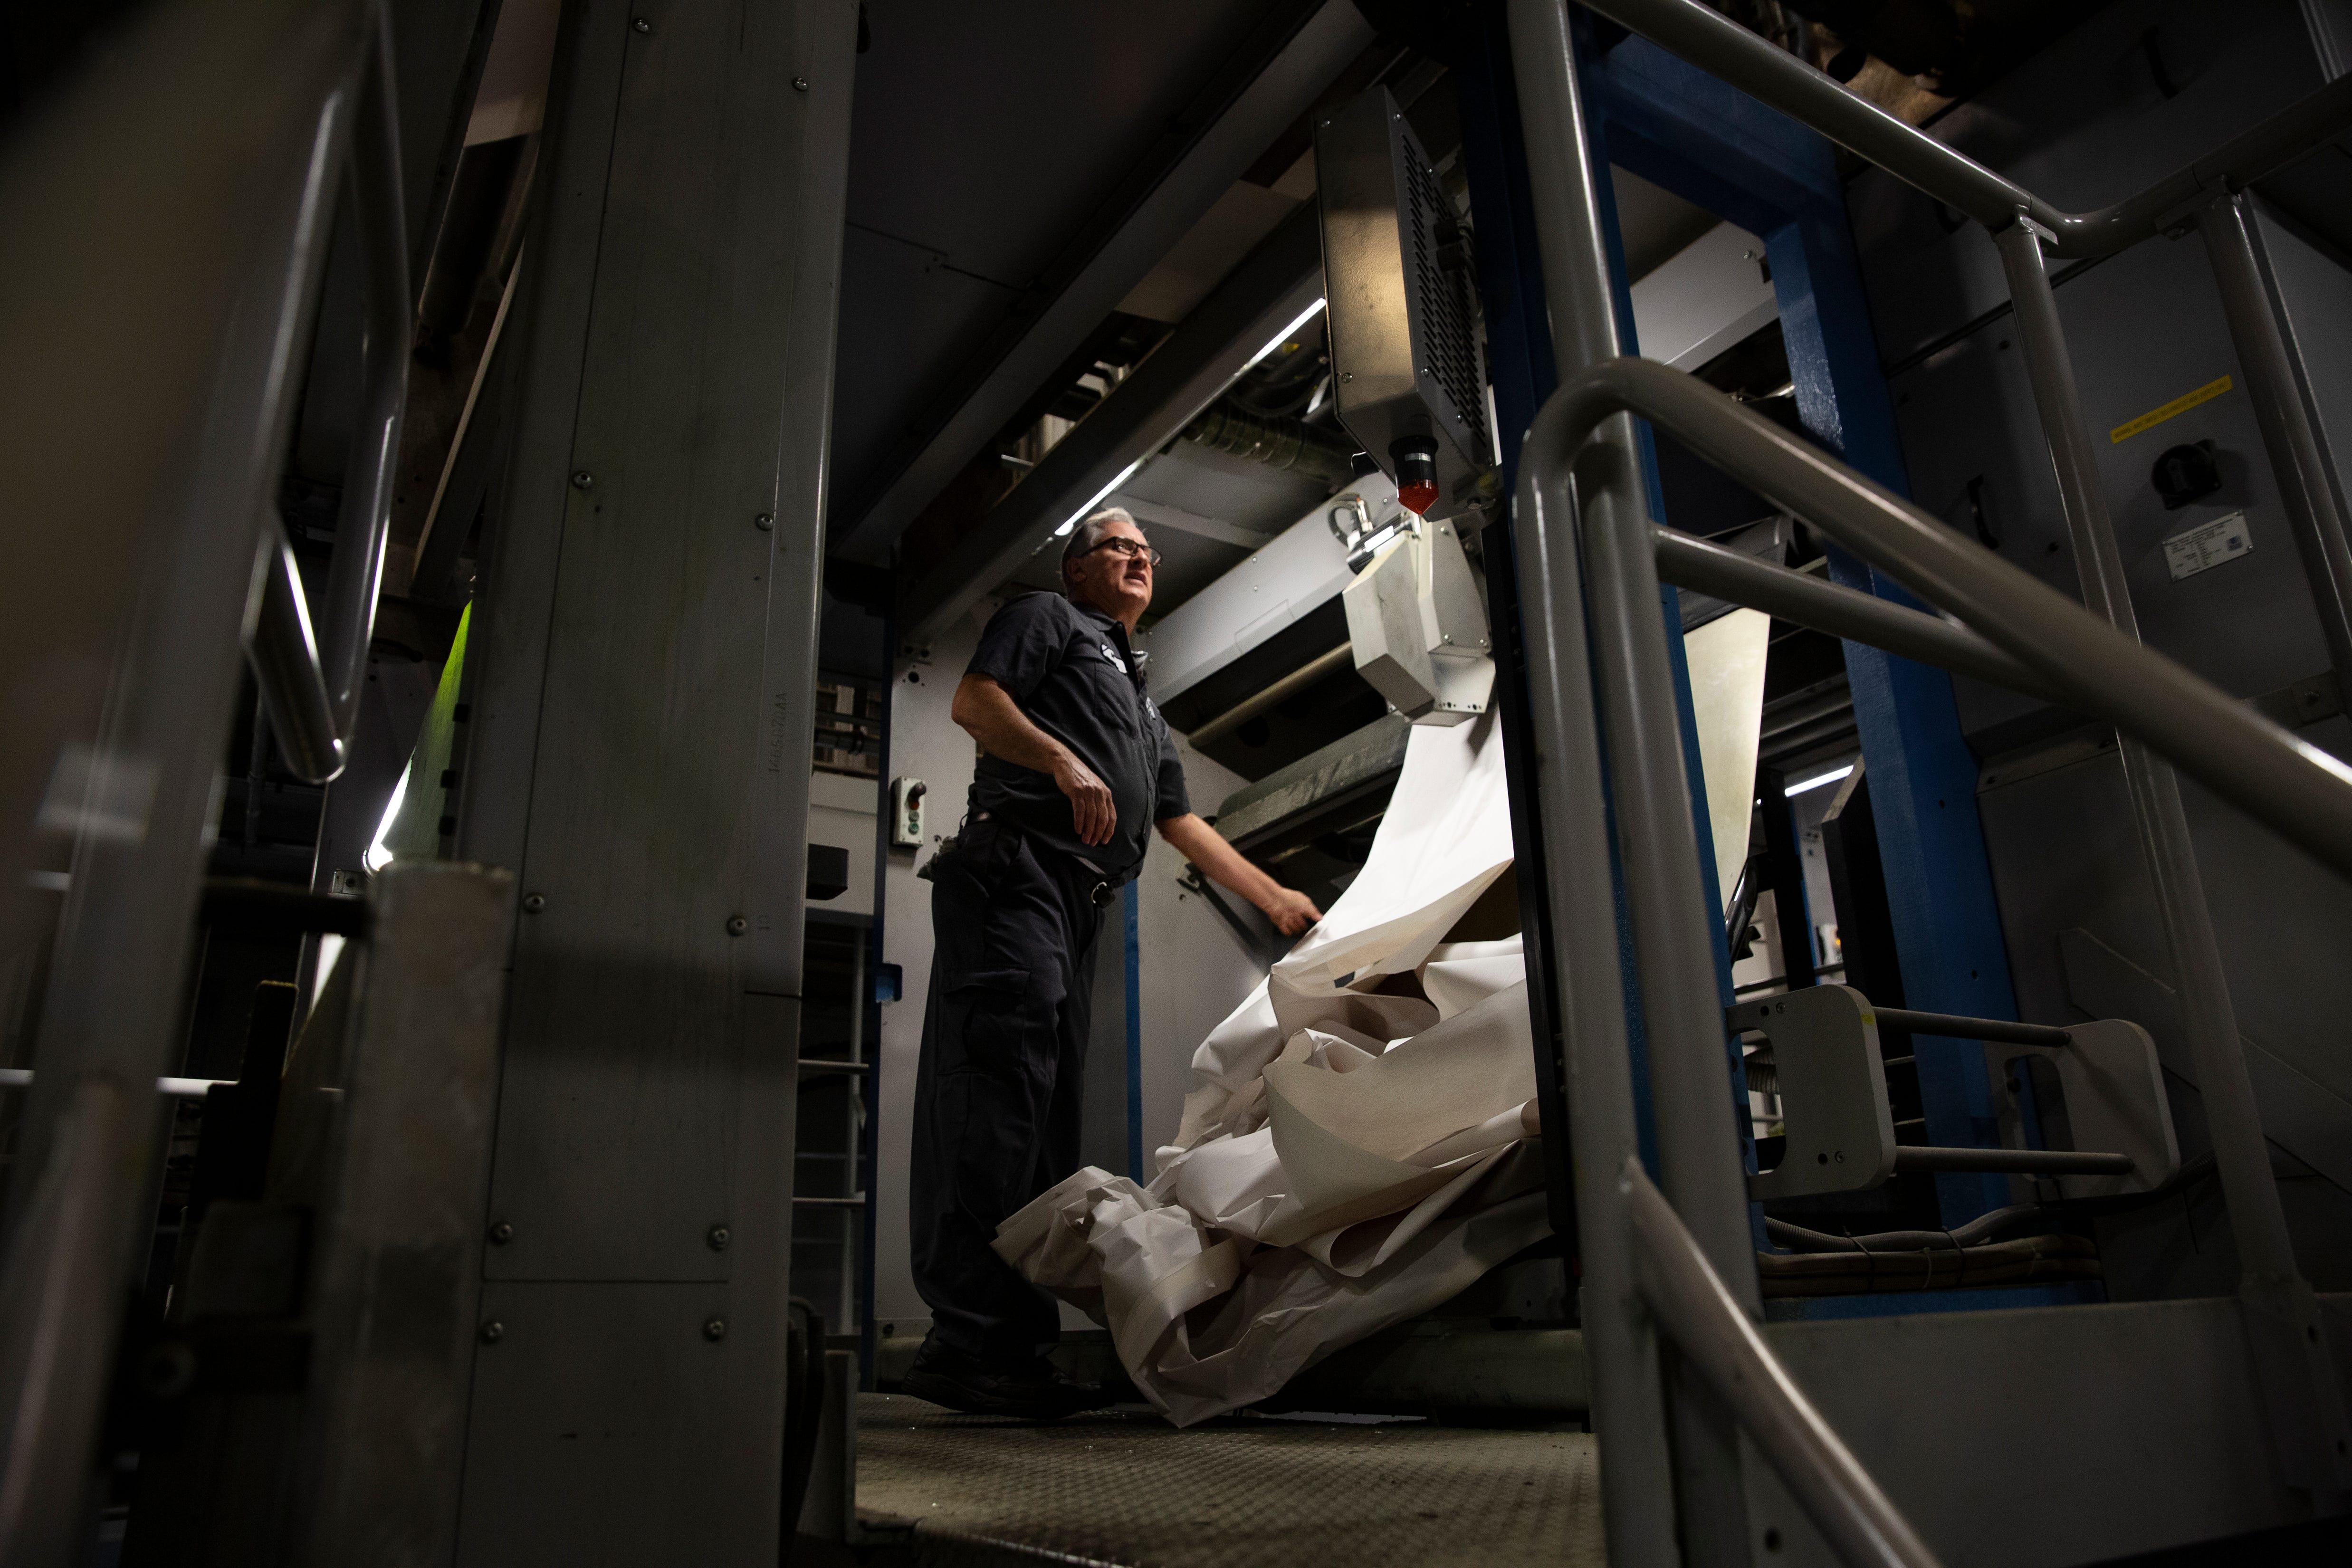 Press operator Mick Eddins prepares the presses for a run, Wednesday, Feb. 12, 2020, at the Naples Daily News.